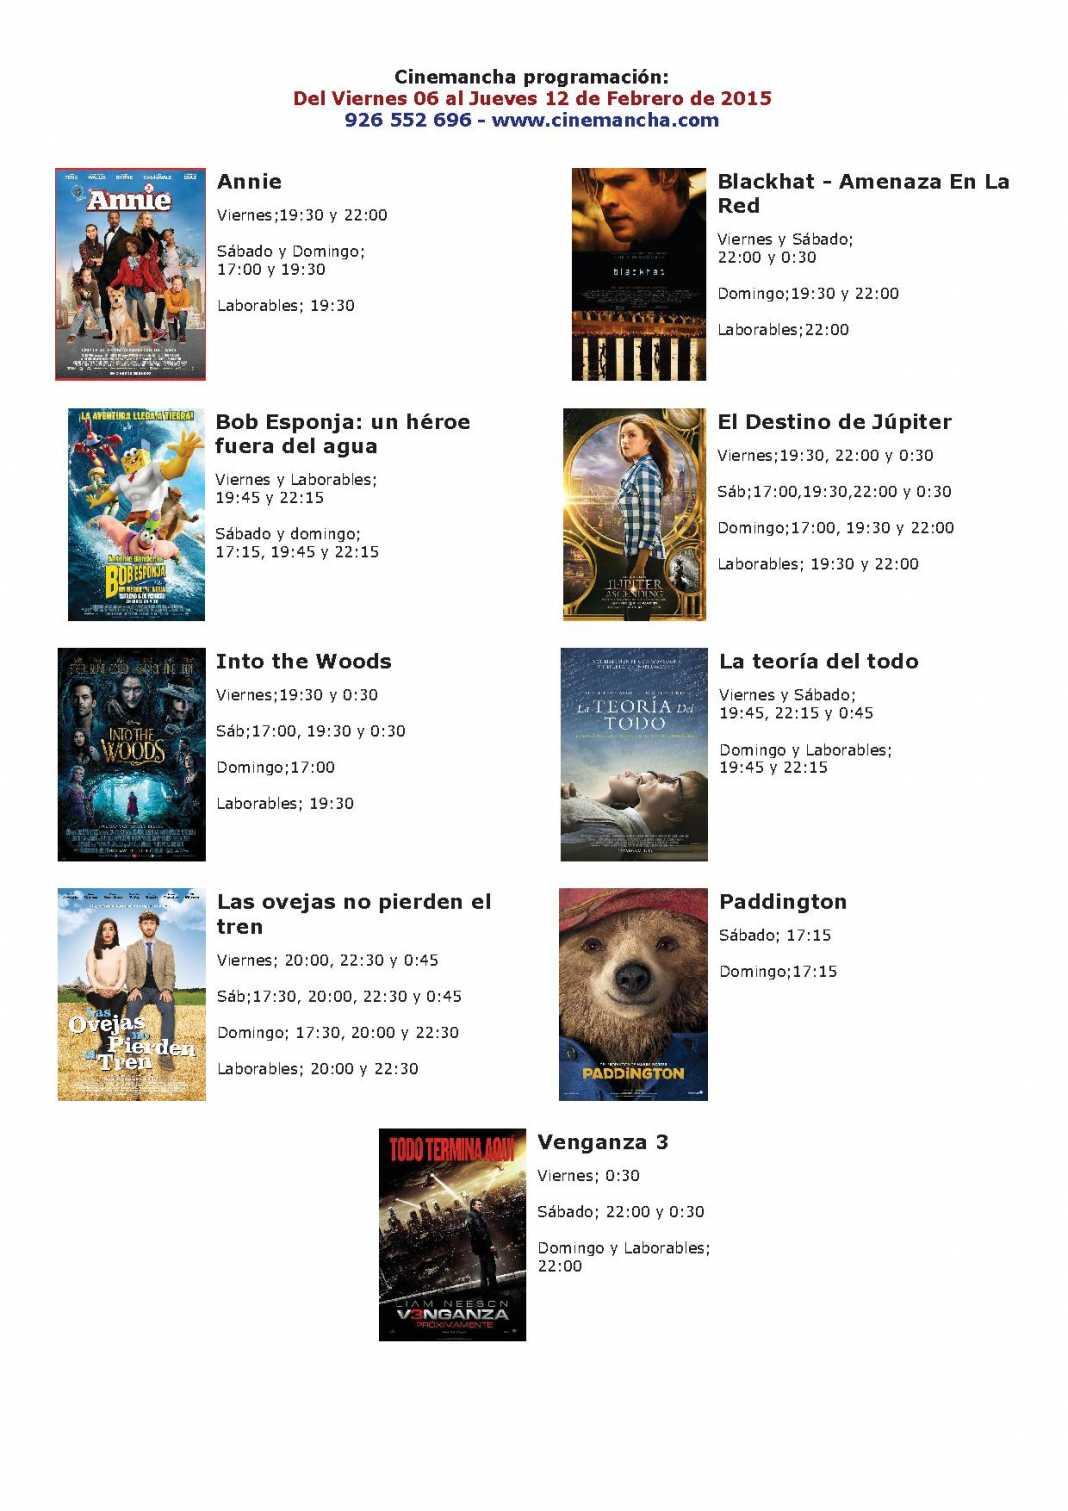 Cartelera de Cinemancha del 06 al 12 de febrero 1